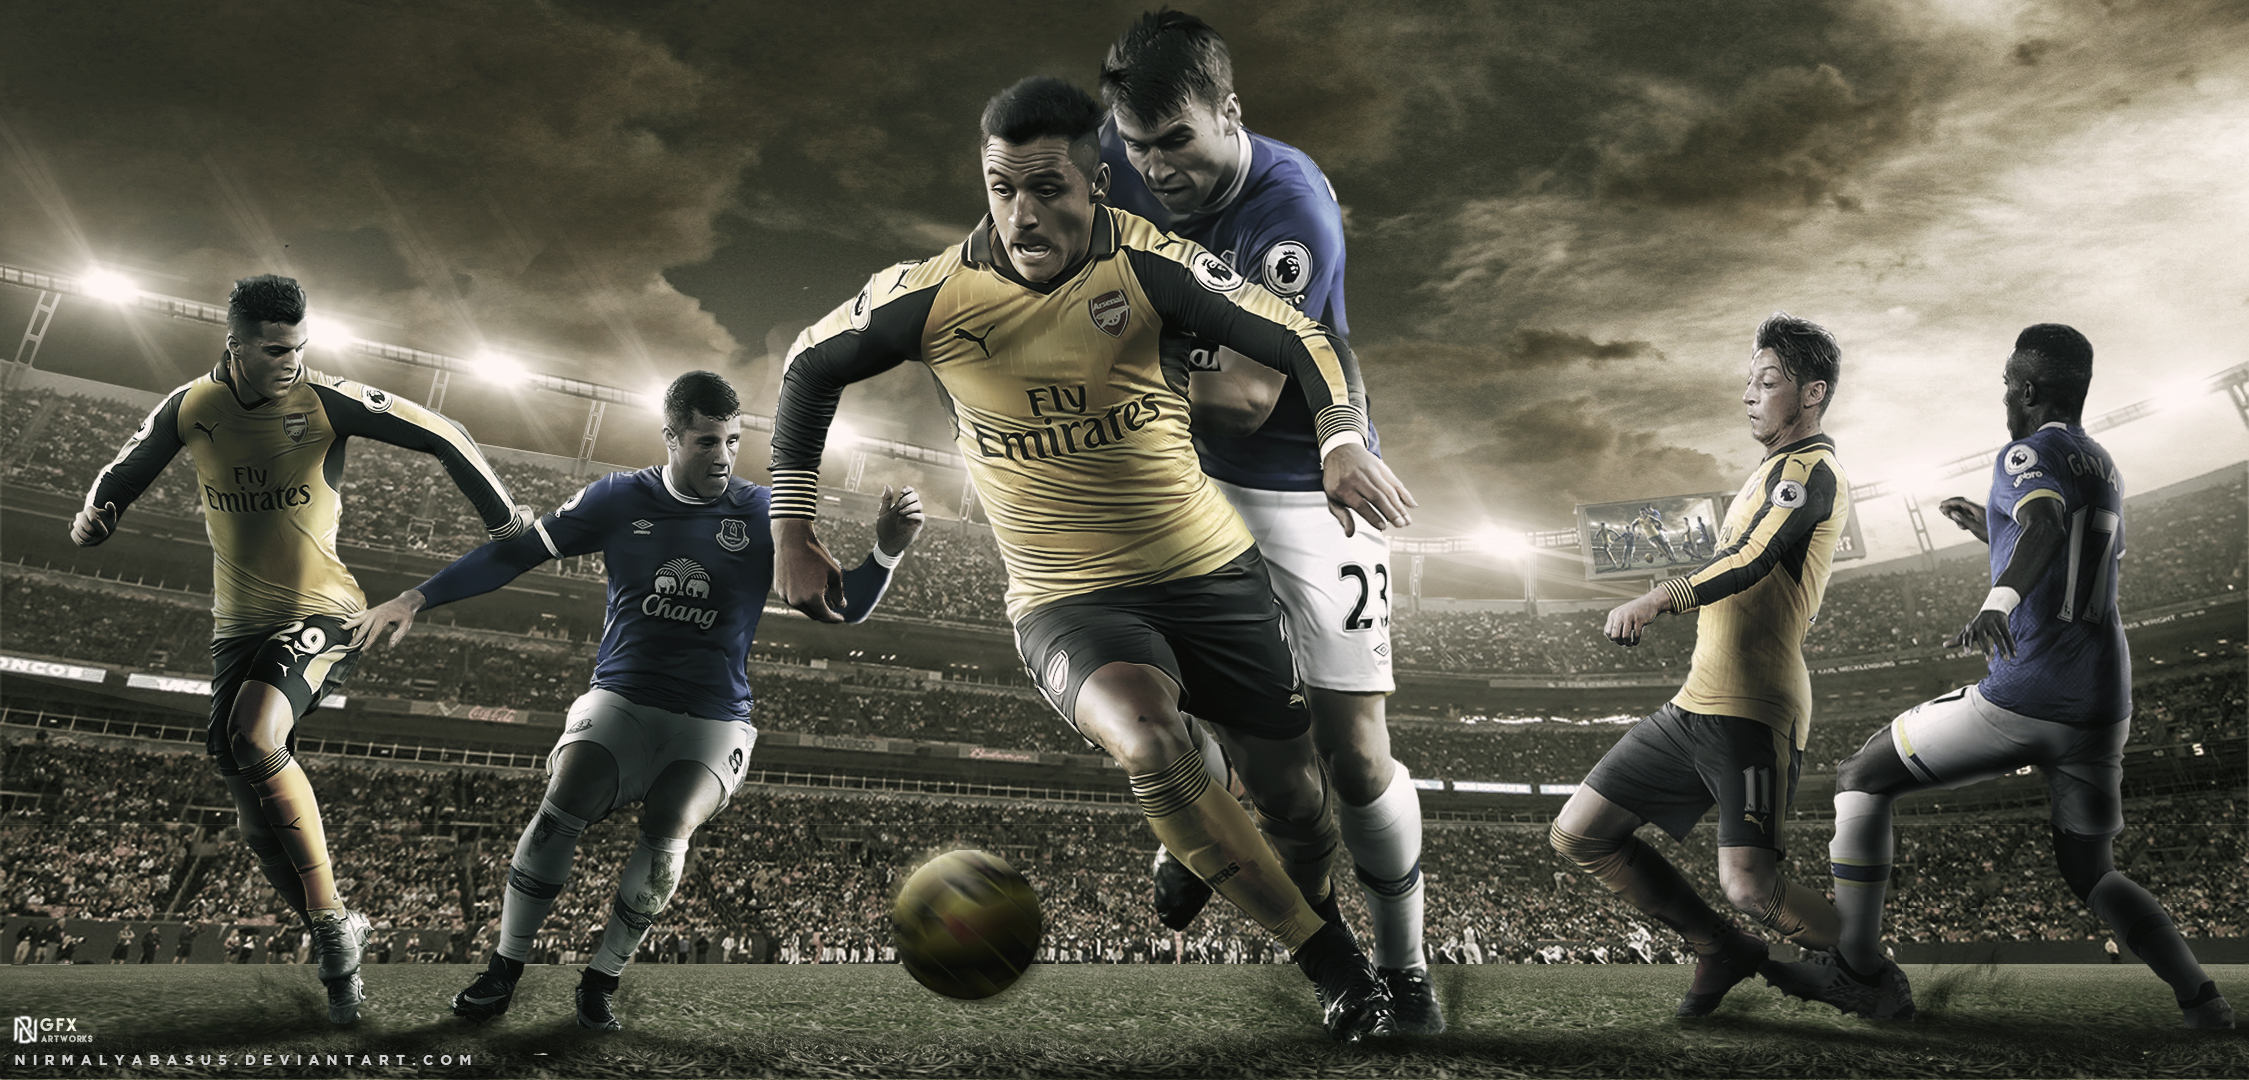 Arsenal FC vs Everton FC Wallpaper by nirmalyabasu5 on ...